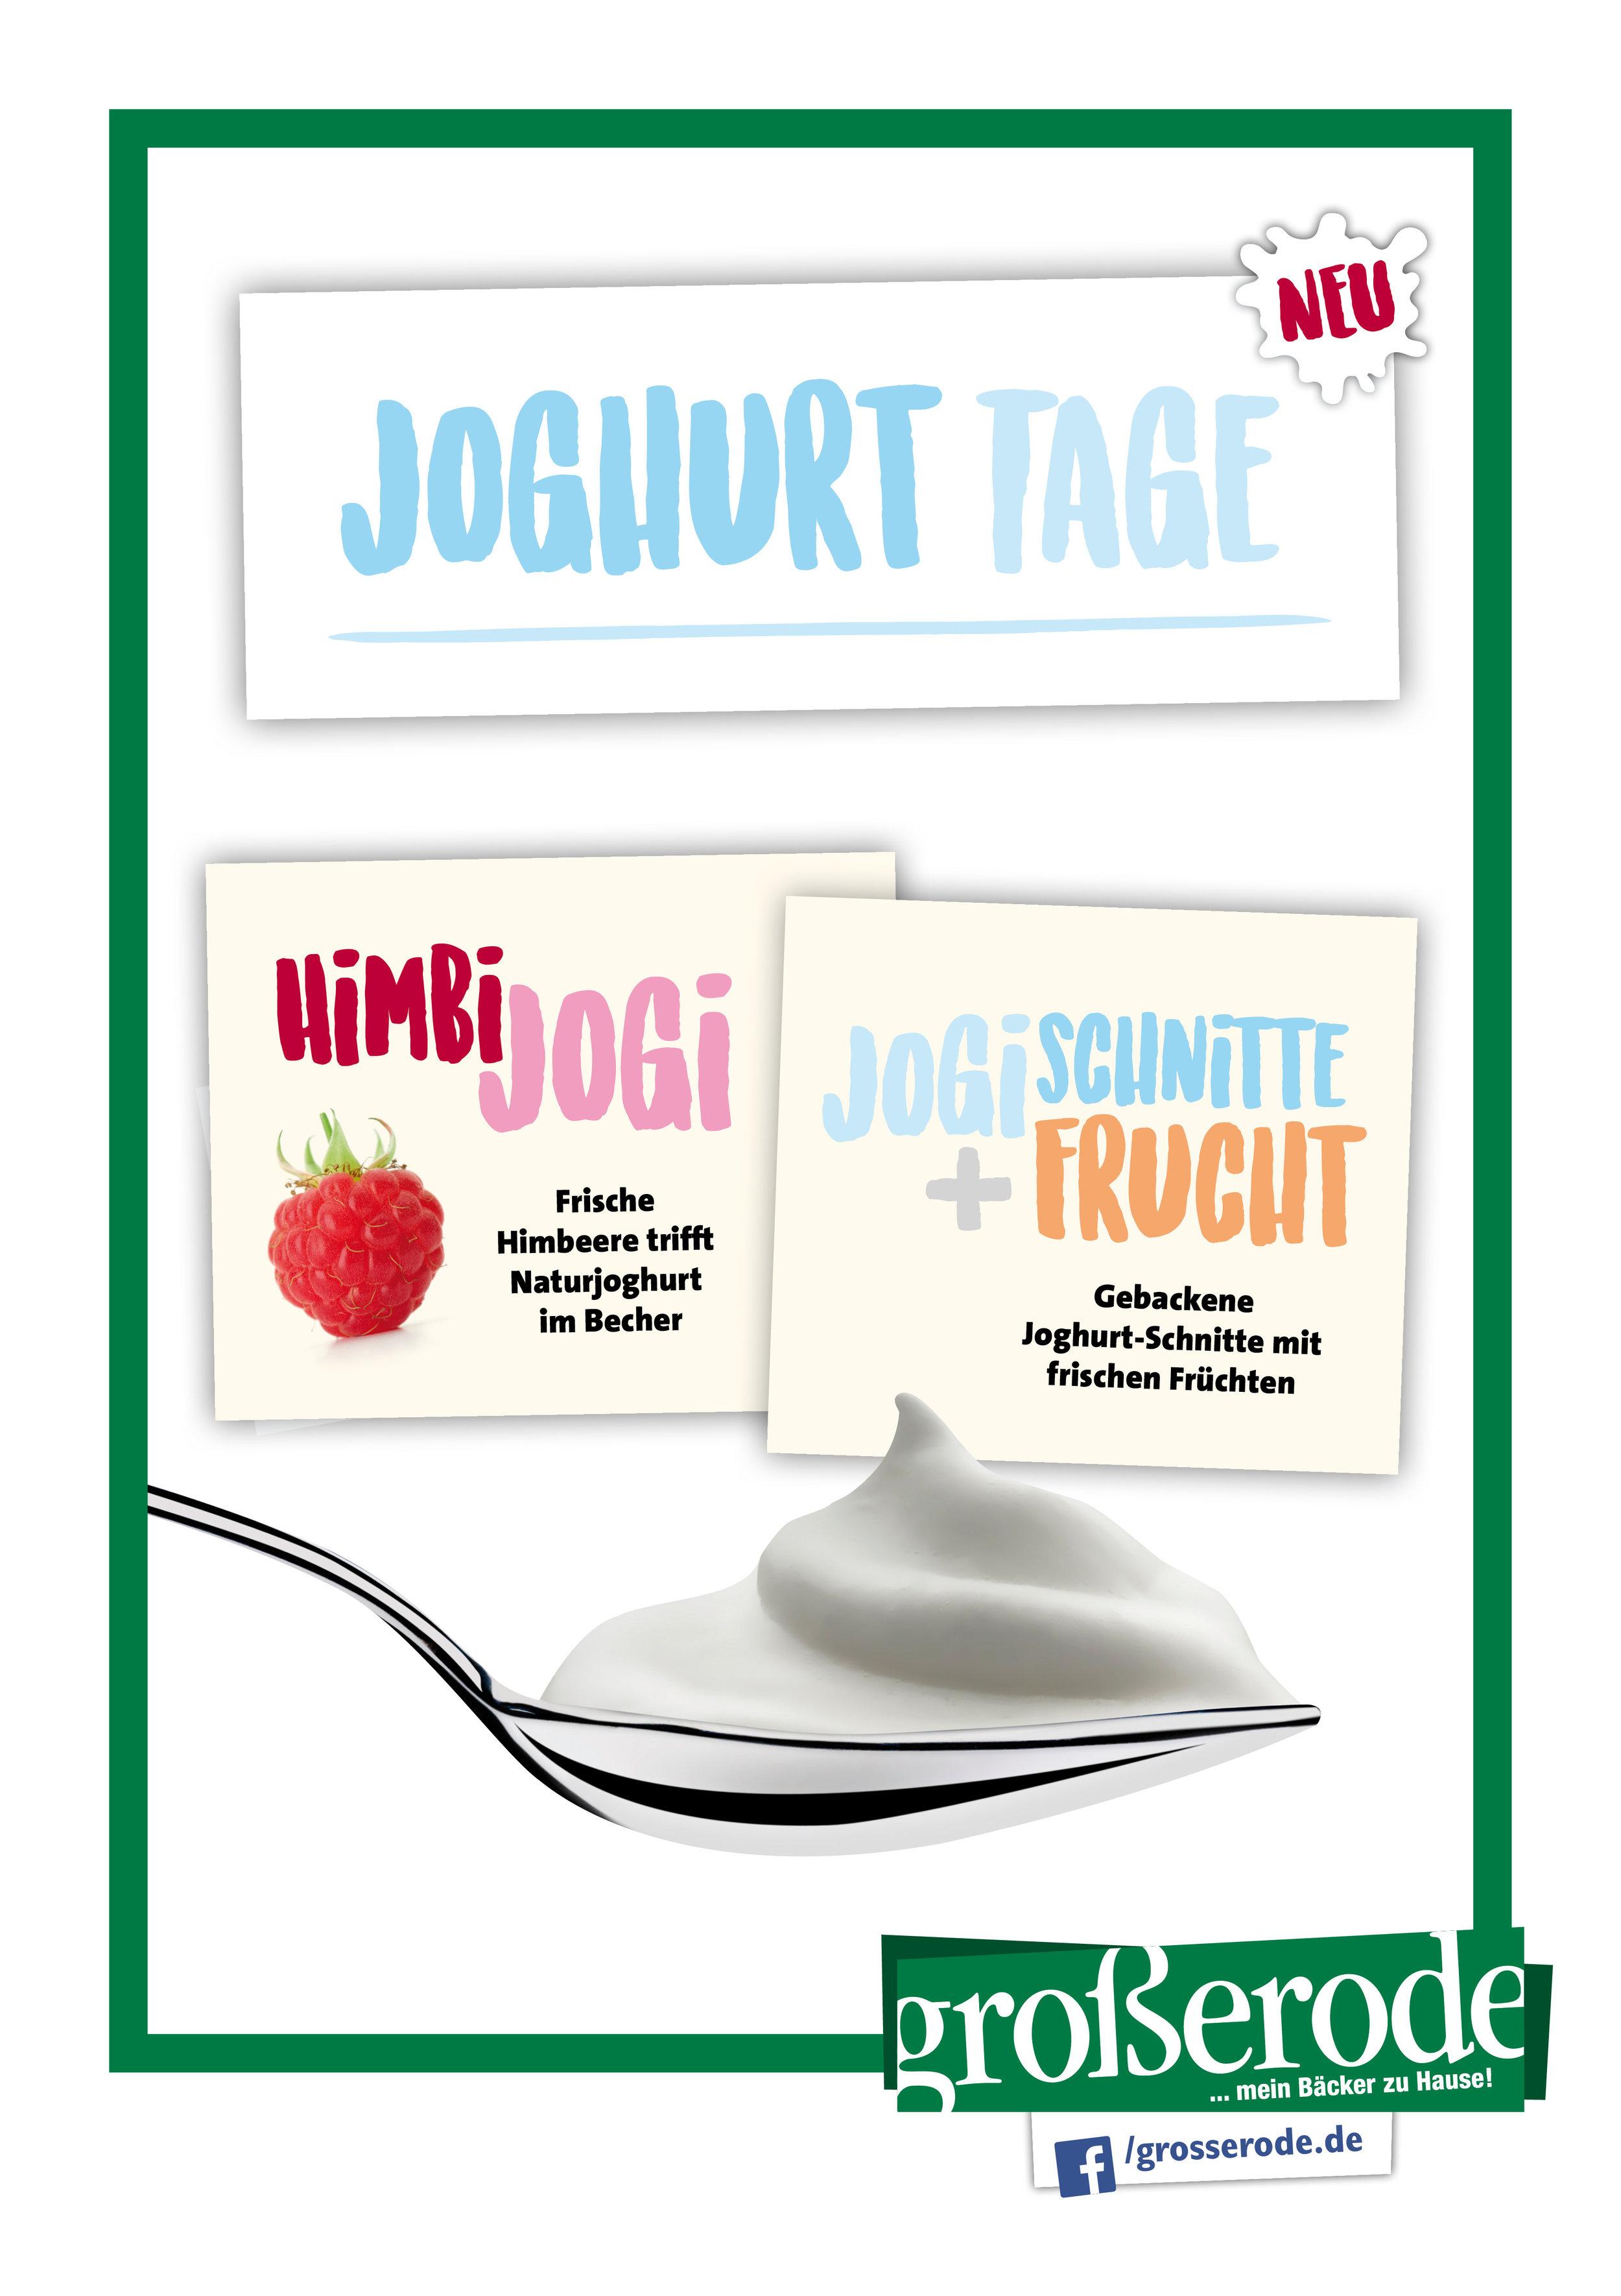 20180405_Grosserode_Joghurt-Tage_Web.jpg